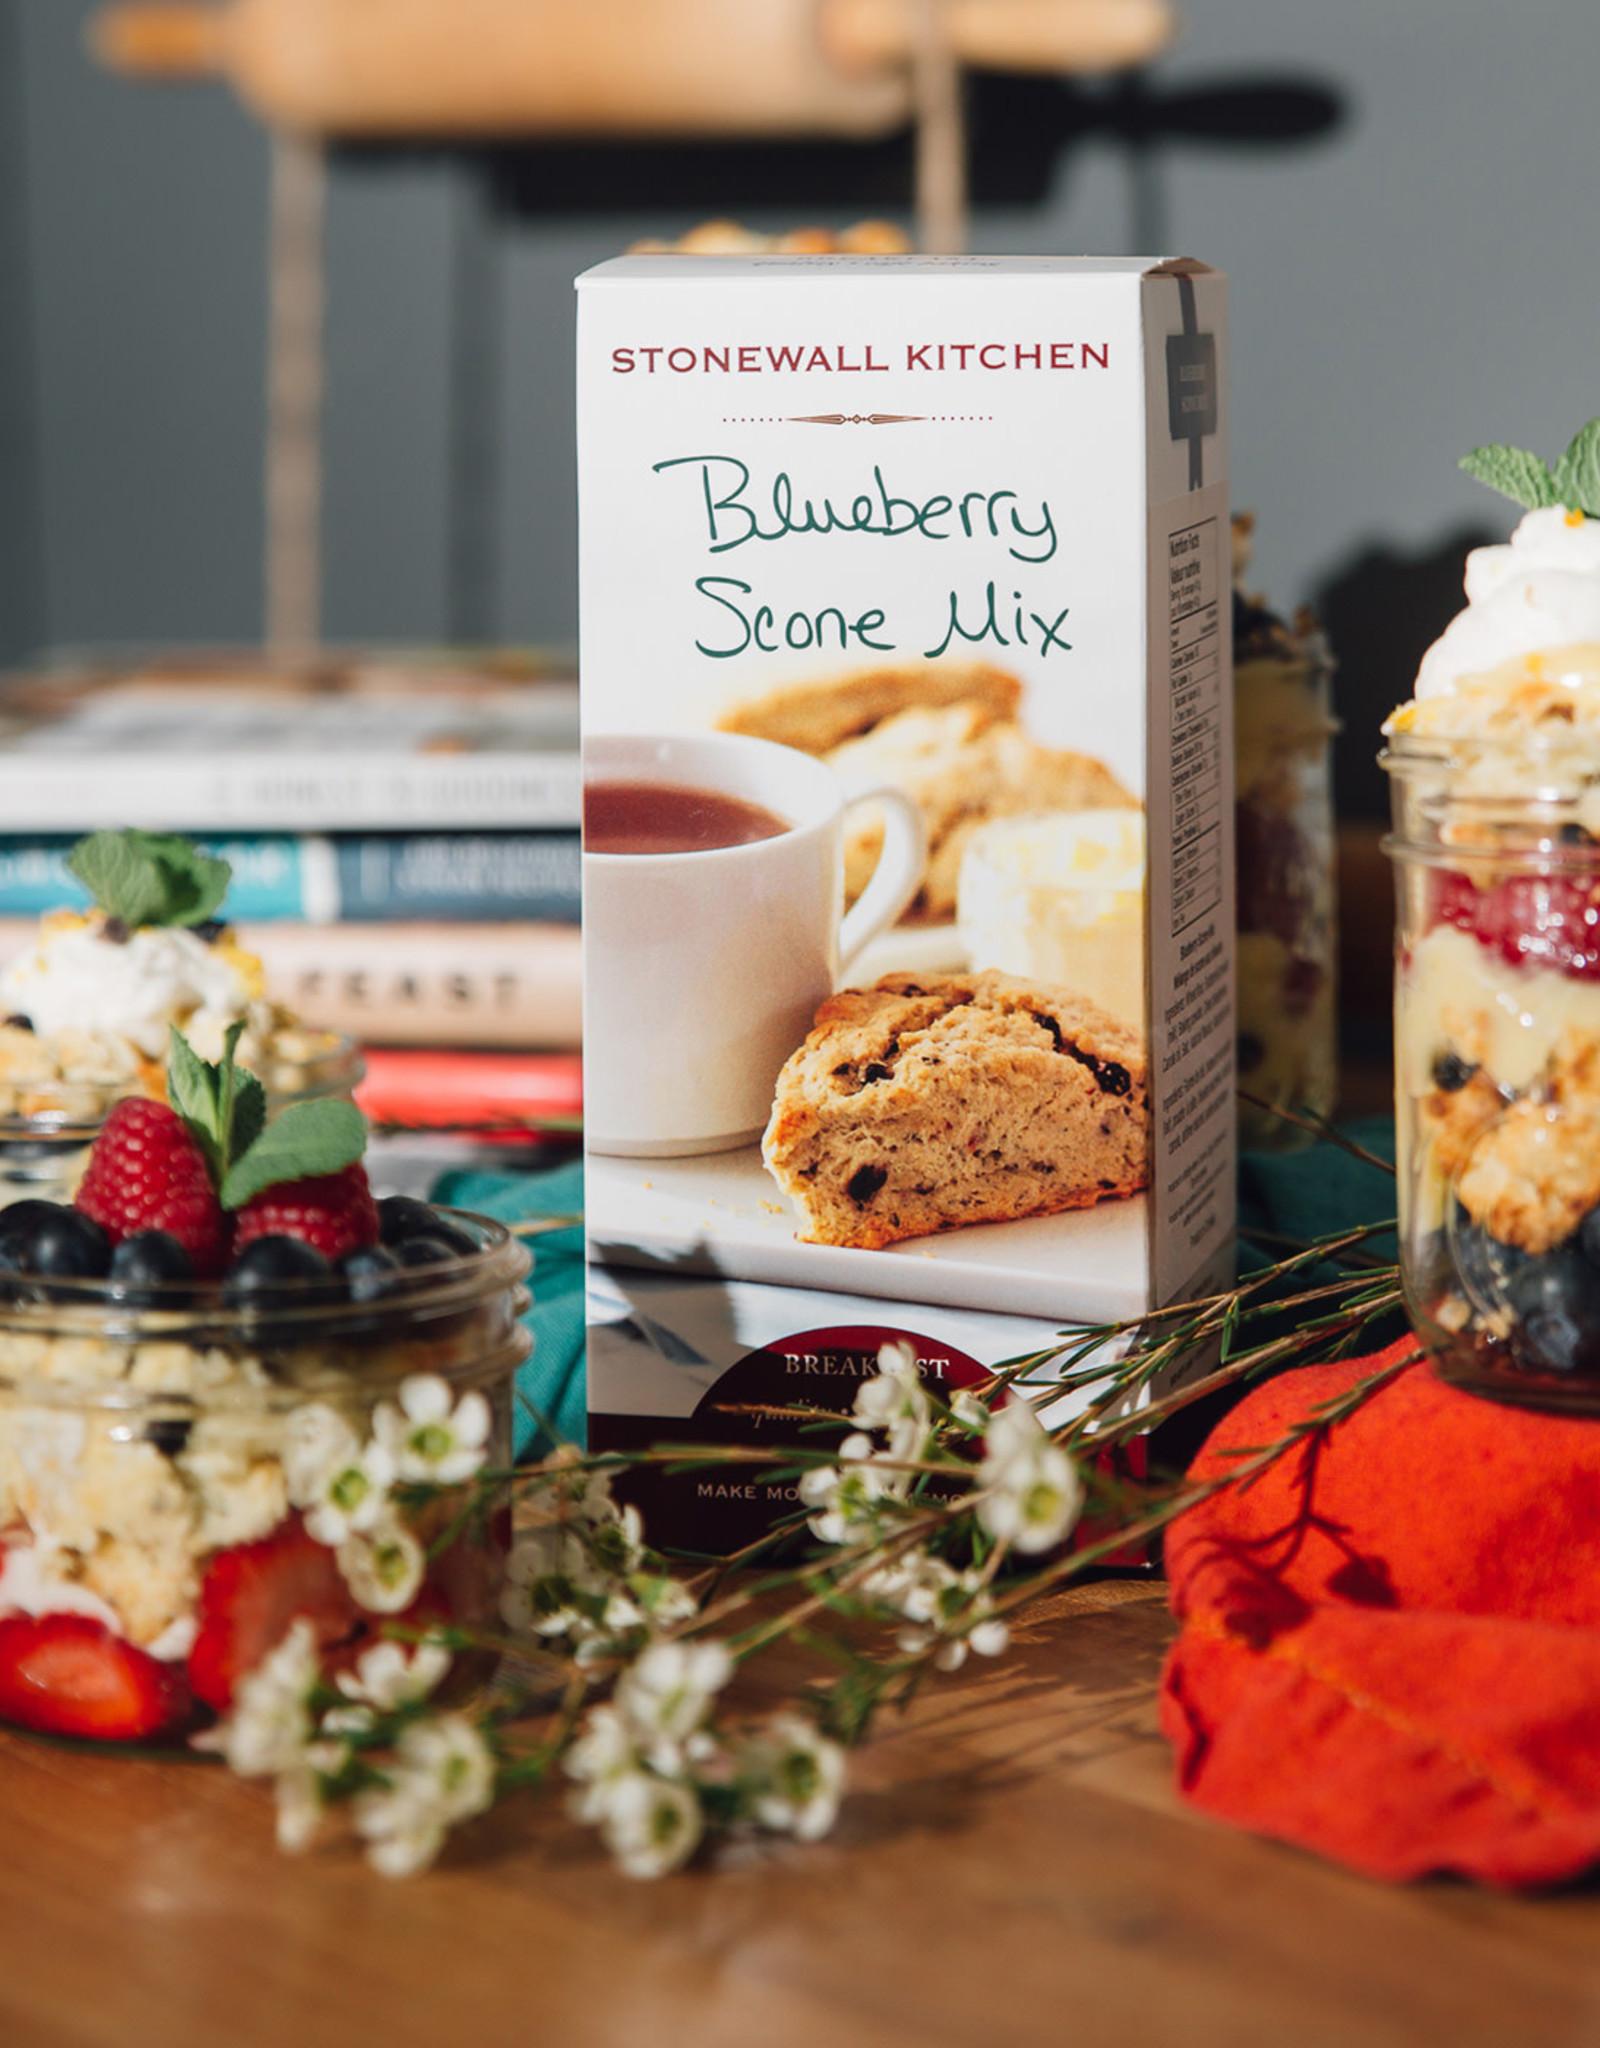 Stonewall Kitchen Blueberry Scone Mix